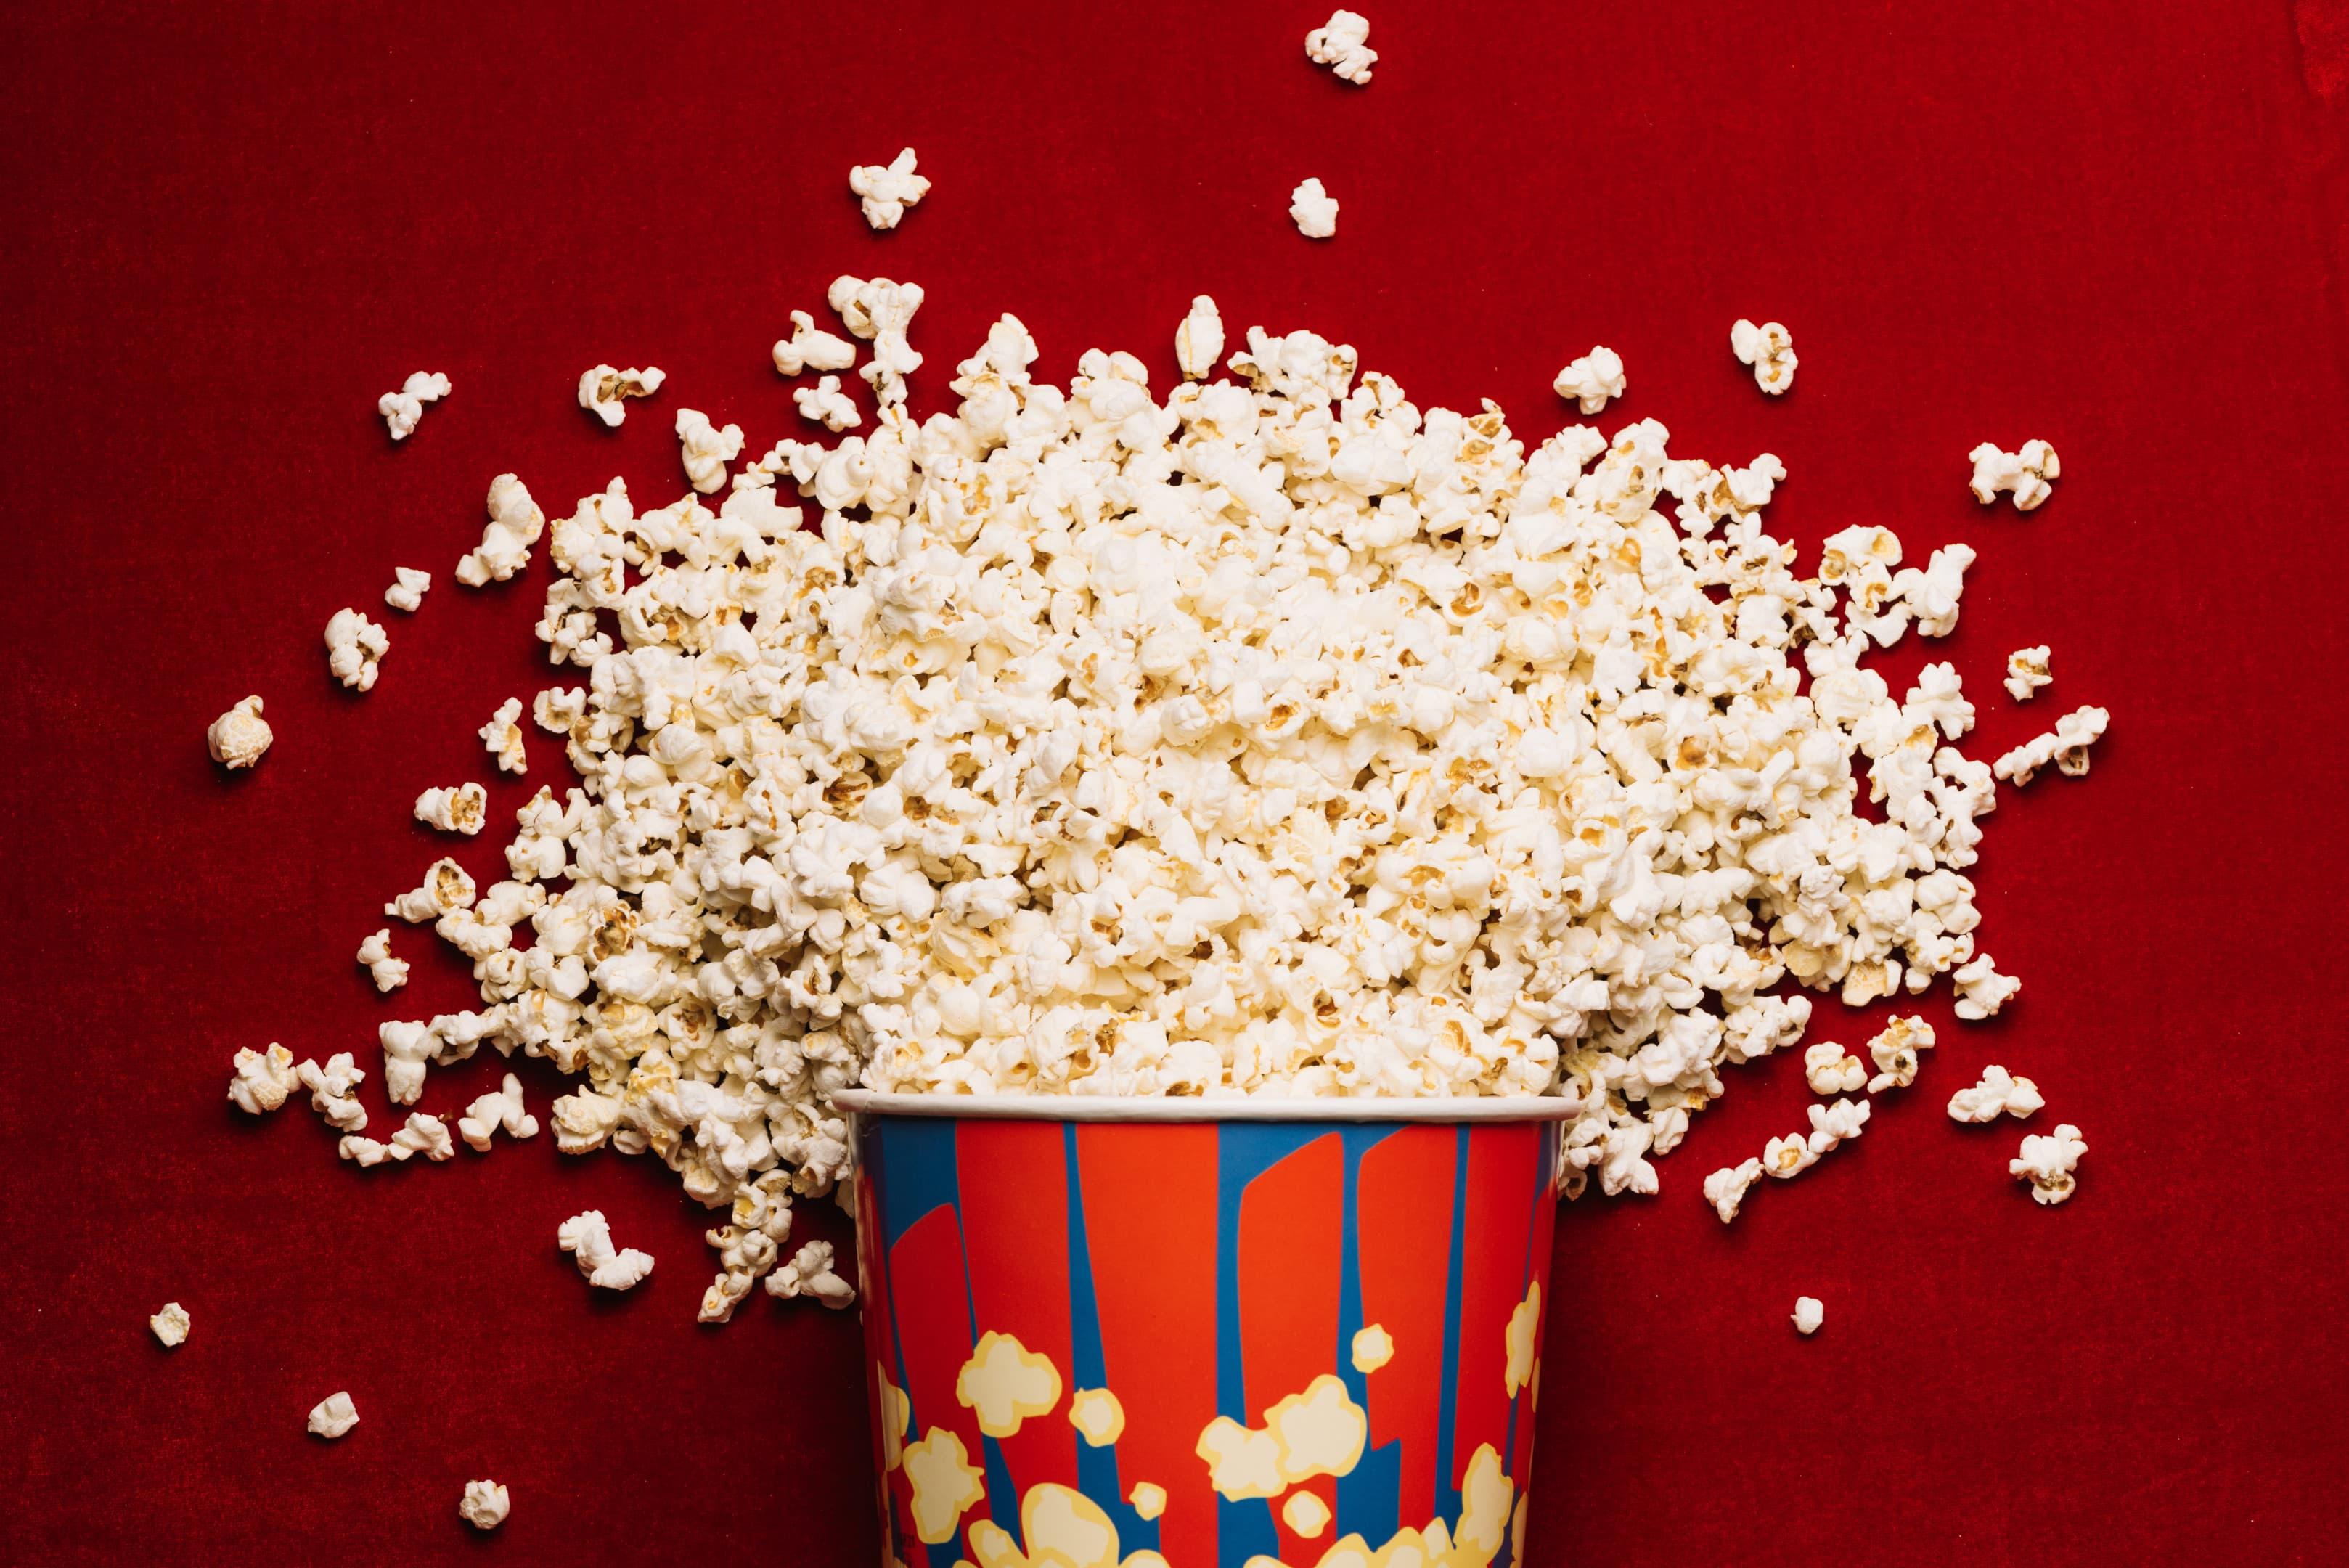 Popcorn spilled from striped bucket on cinema floor